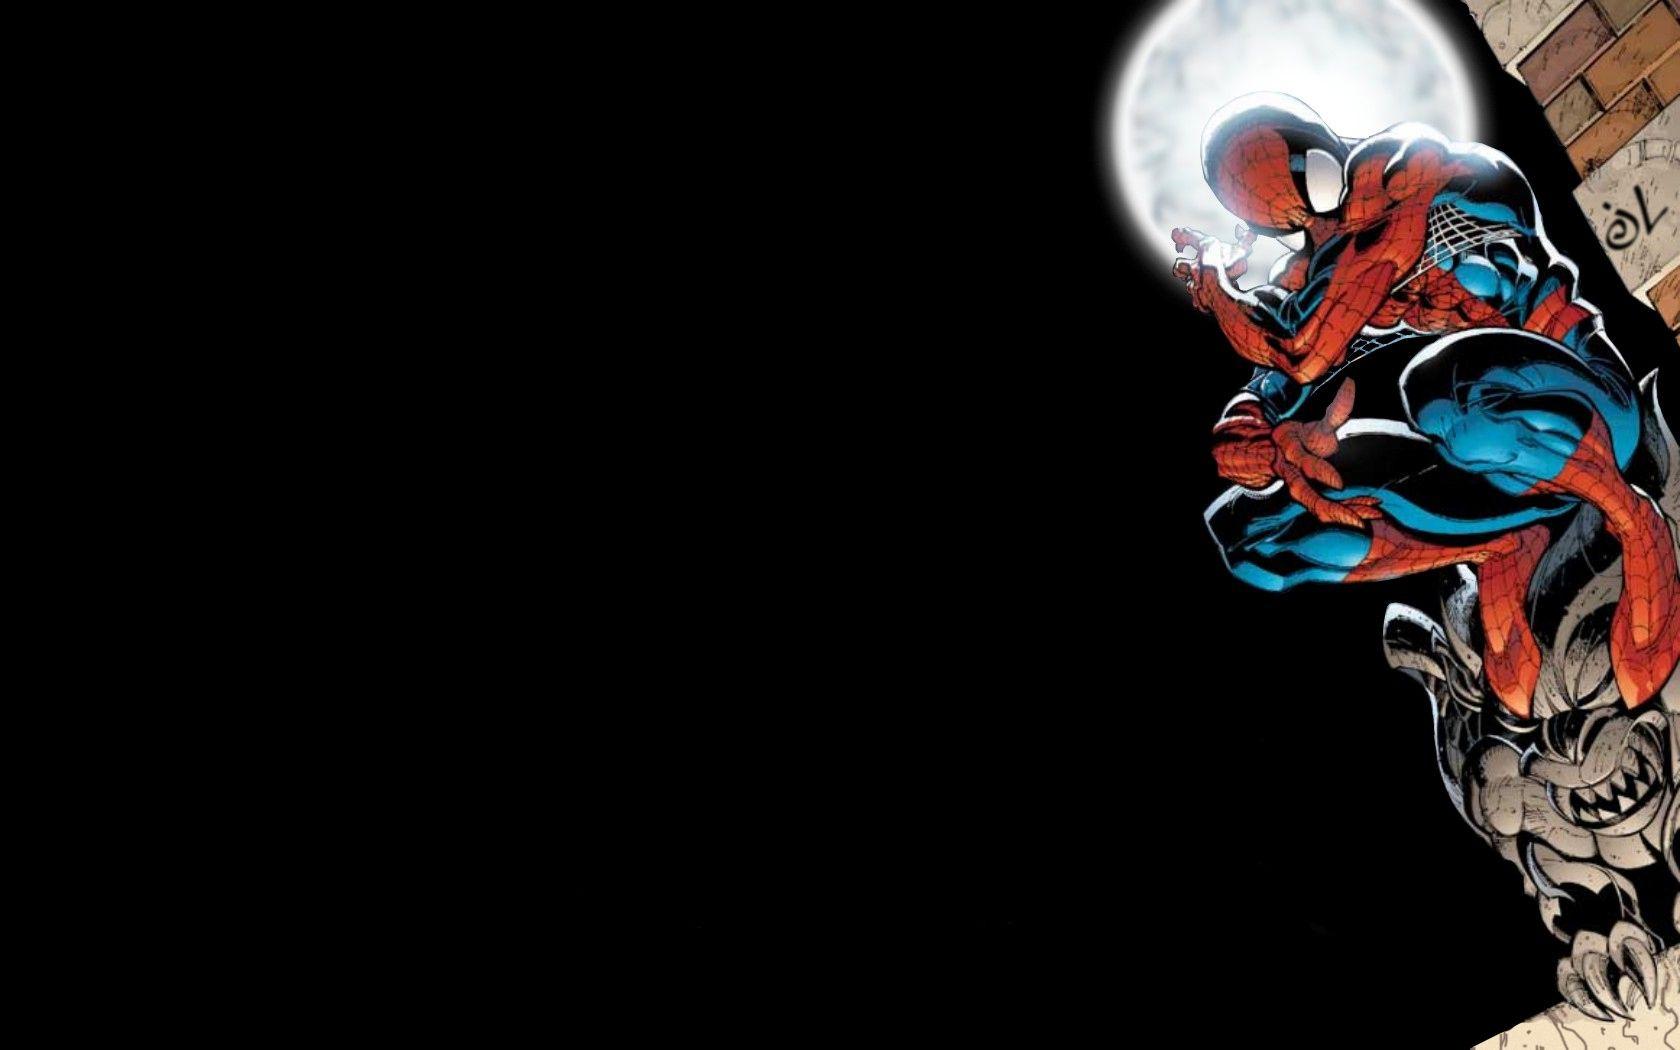 Spiderman Comic Wallpaper Hd Wallpaper Marvel Wallpaper Marvel Wallpaper Hd Marvel Background